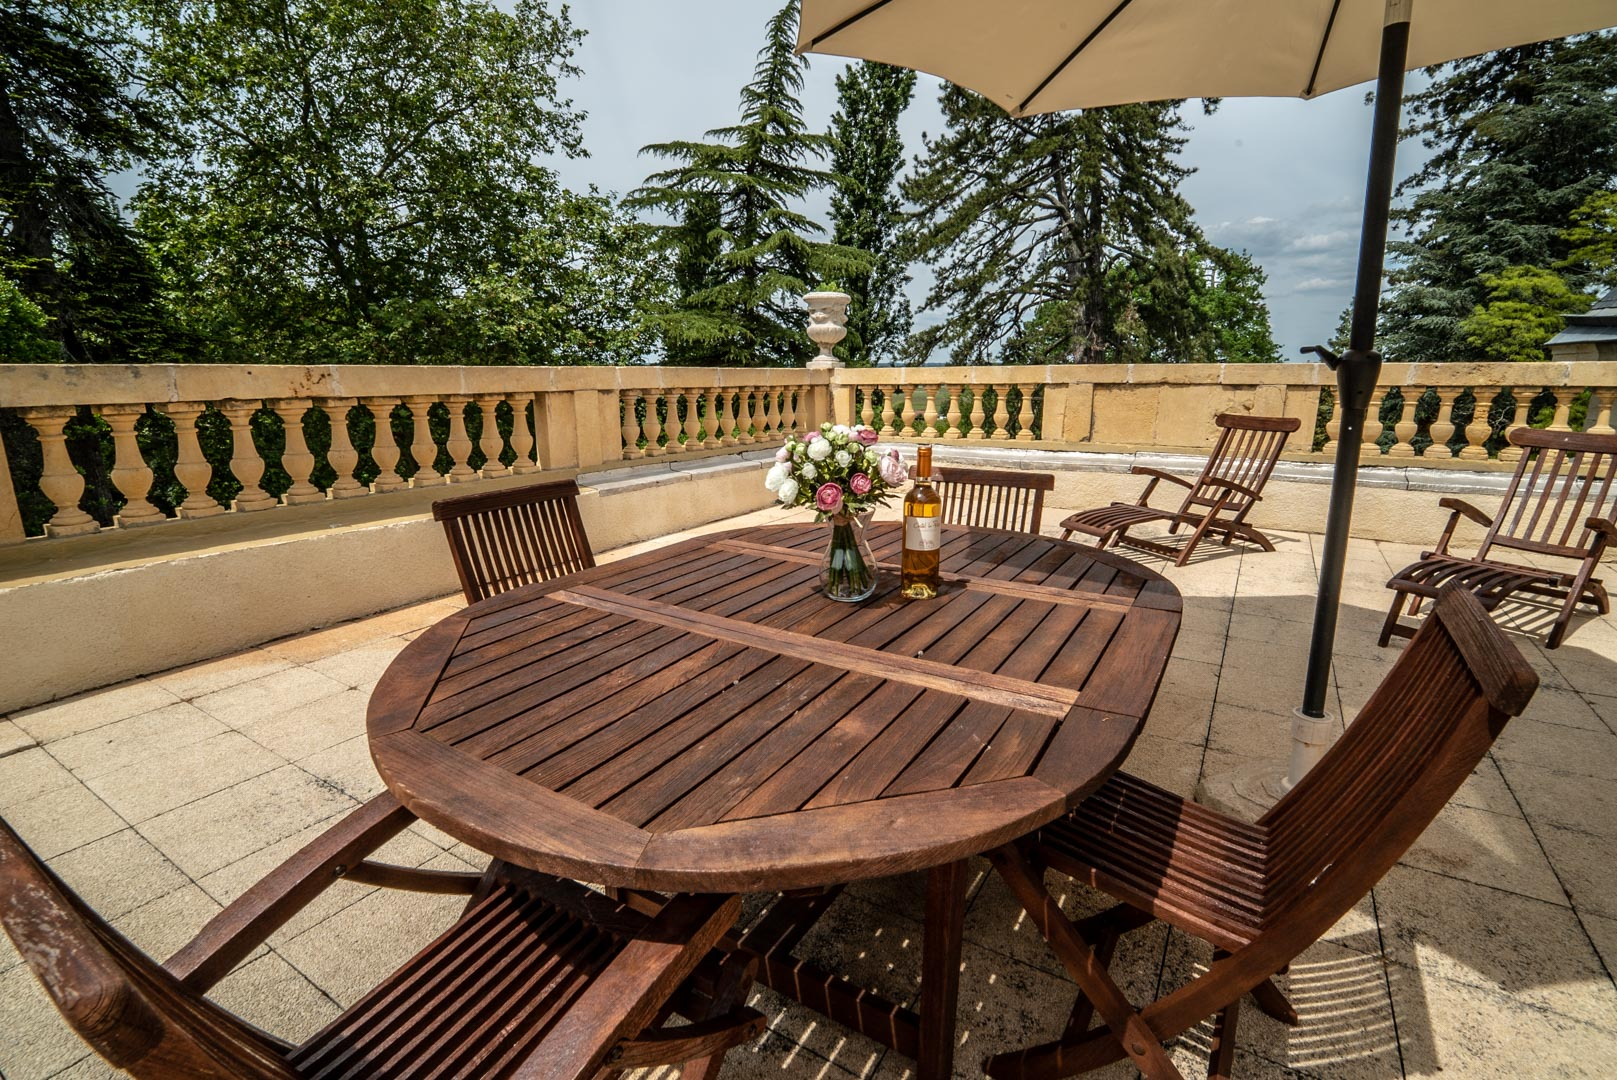 Terrasse Chateau Rauly location bergerac Monbazillac